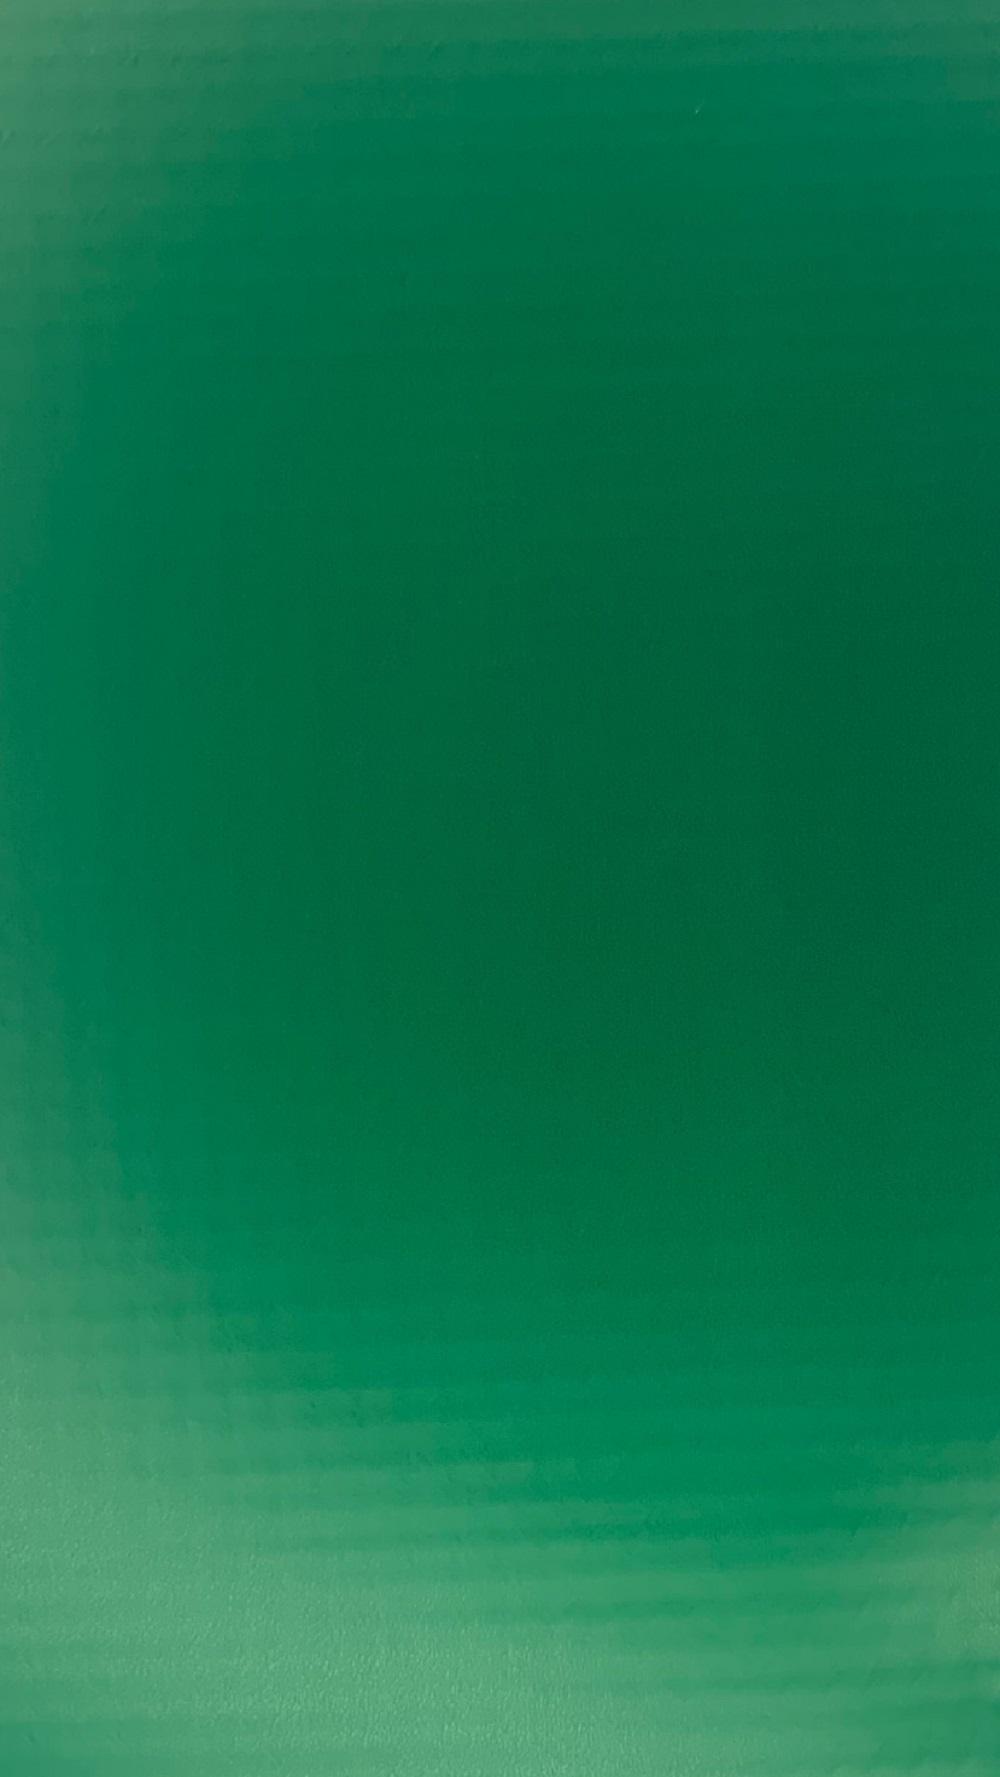 Lona Vinilona Df Fosca Verde S-485 1,45mt X 1,0mt